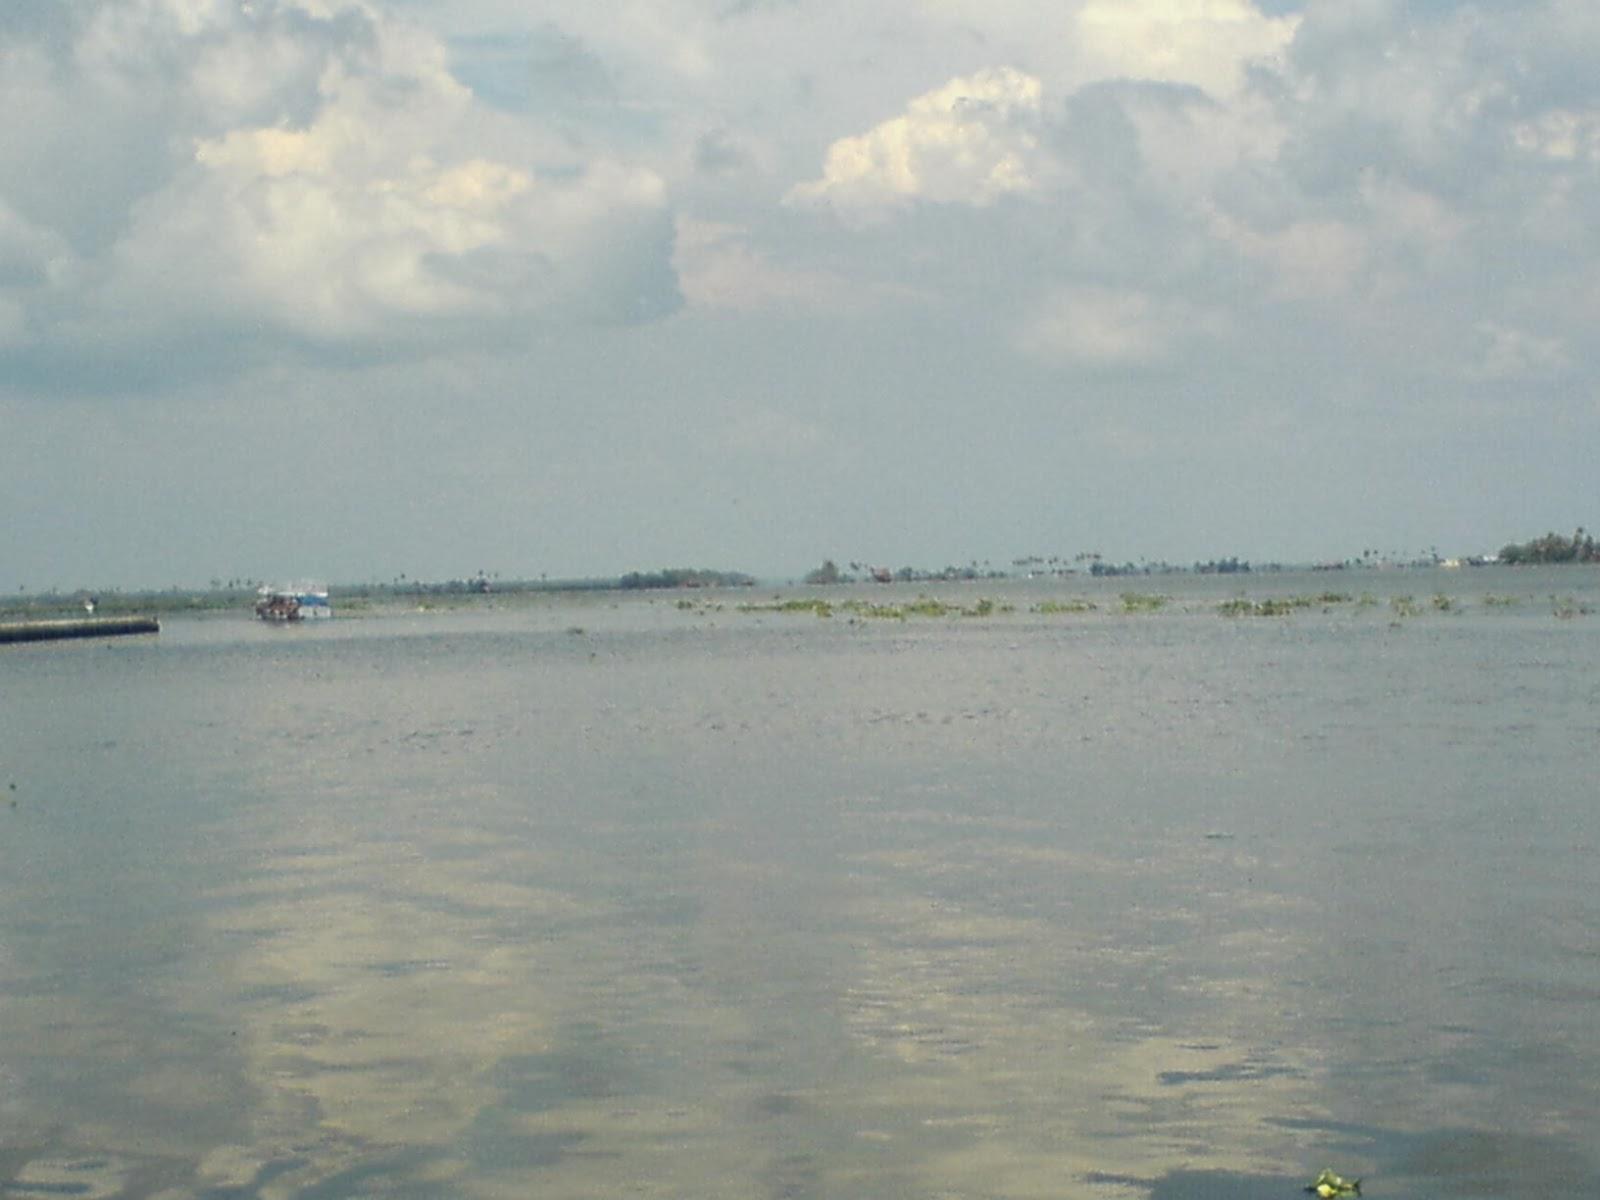 Alapuzha